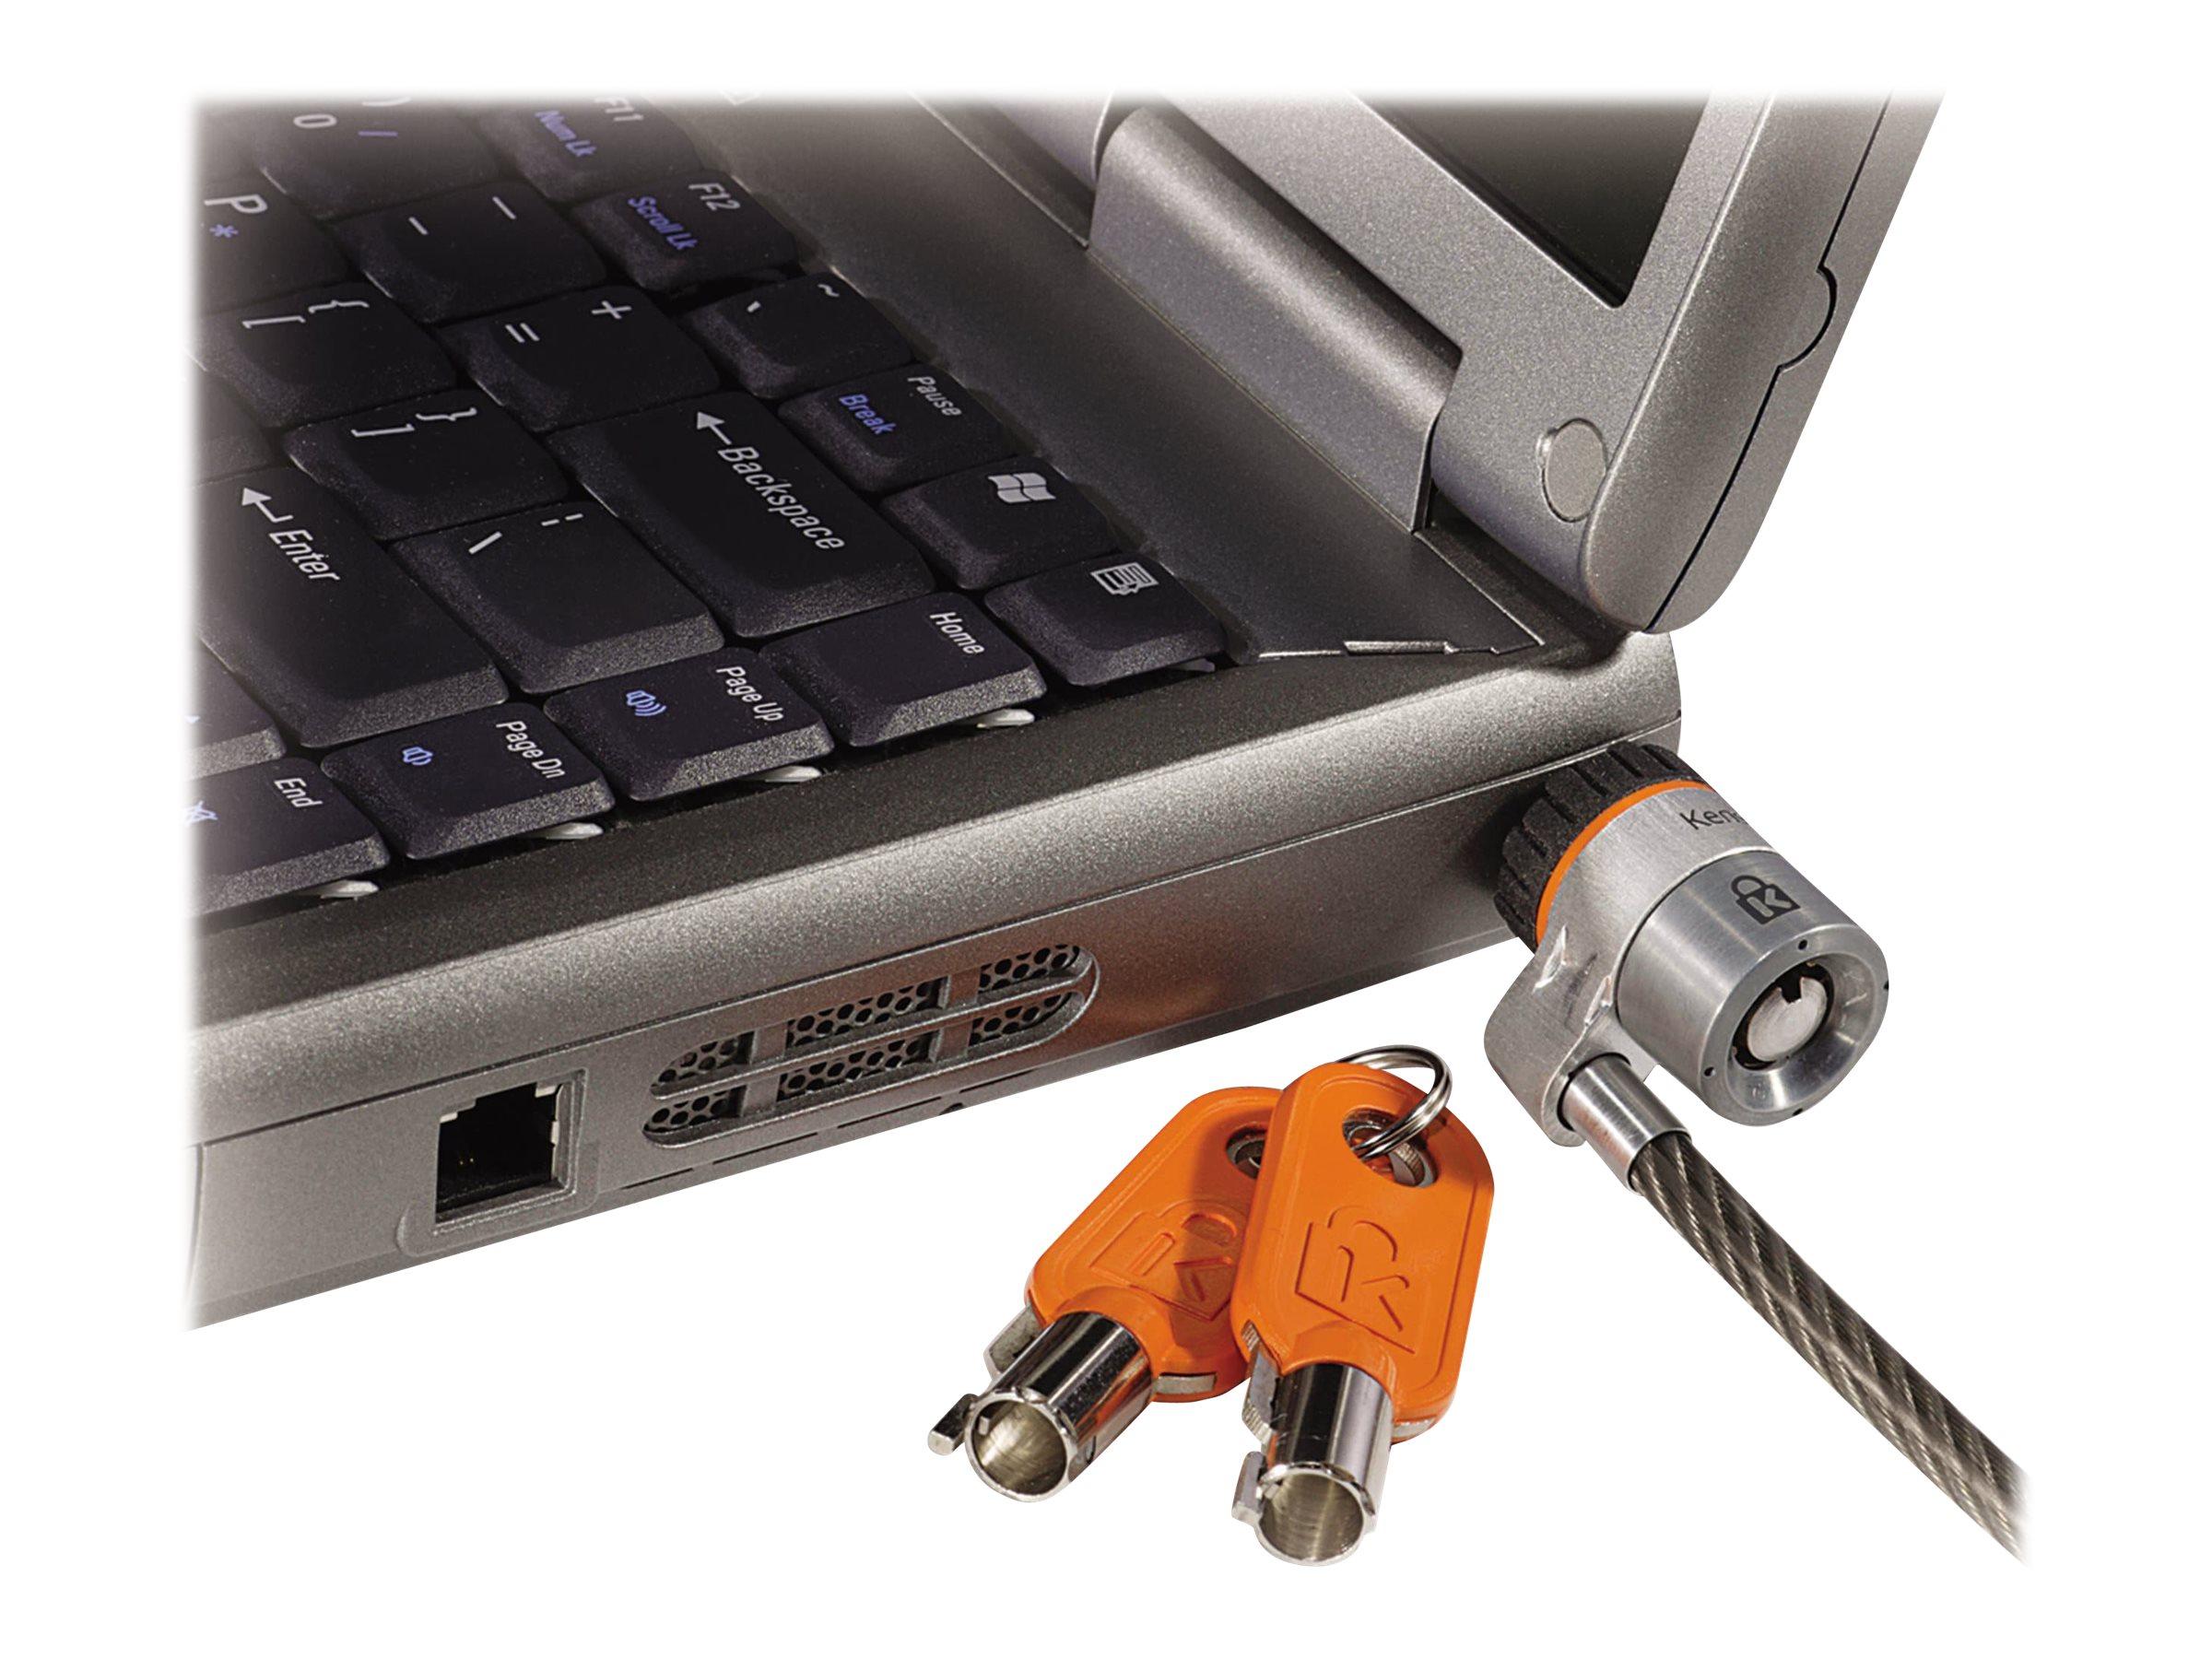 Kensington MicroSaver Master-keyed security cable lock